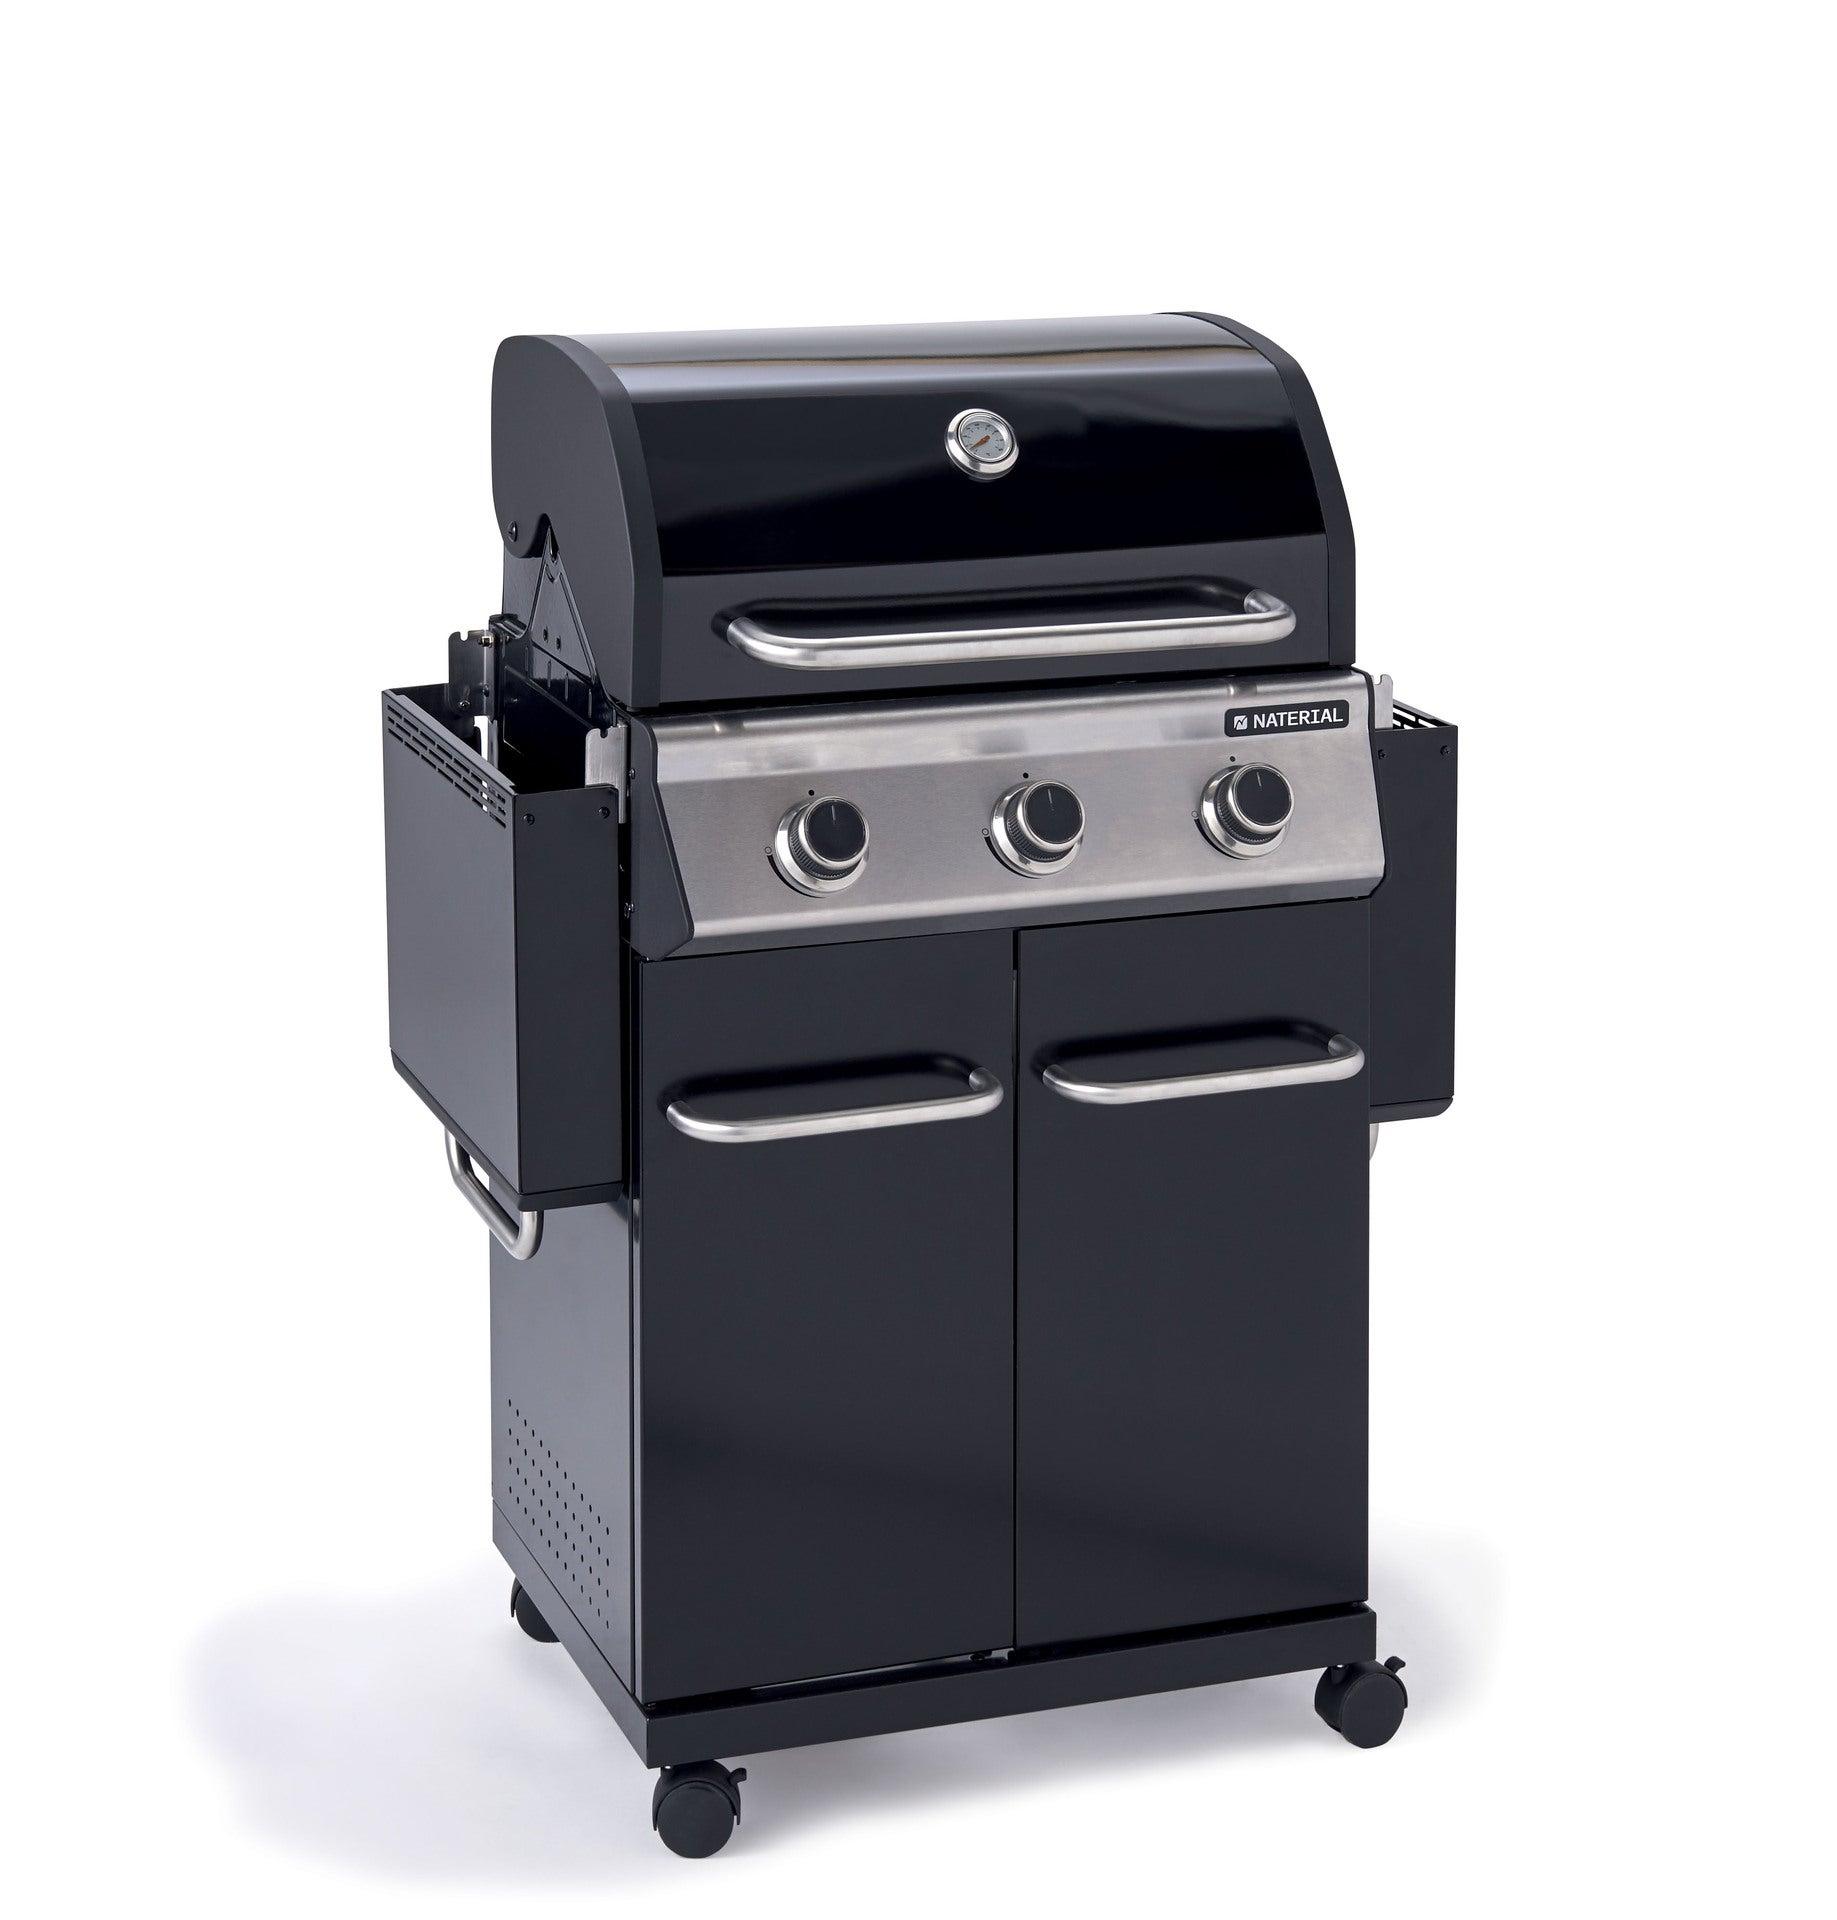 Barbecue au gaz 154 x 55 x 114 cm NATERIAL Kenton, 4